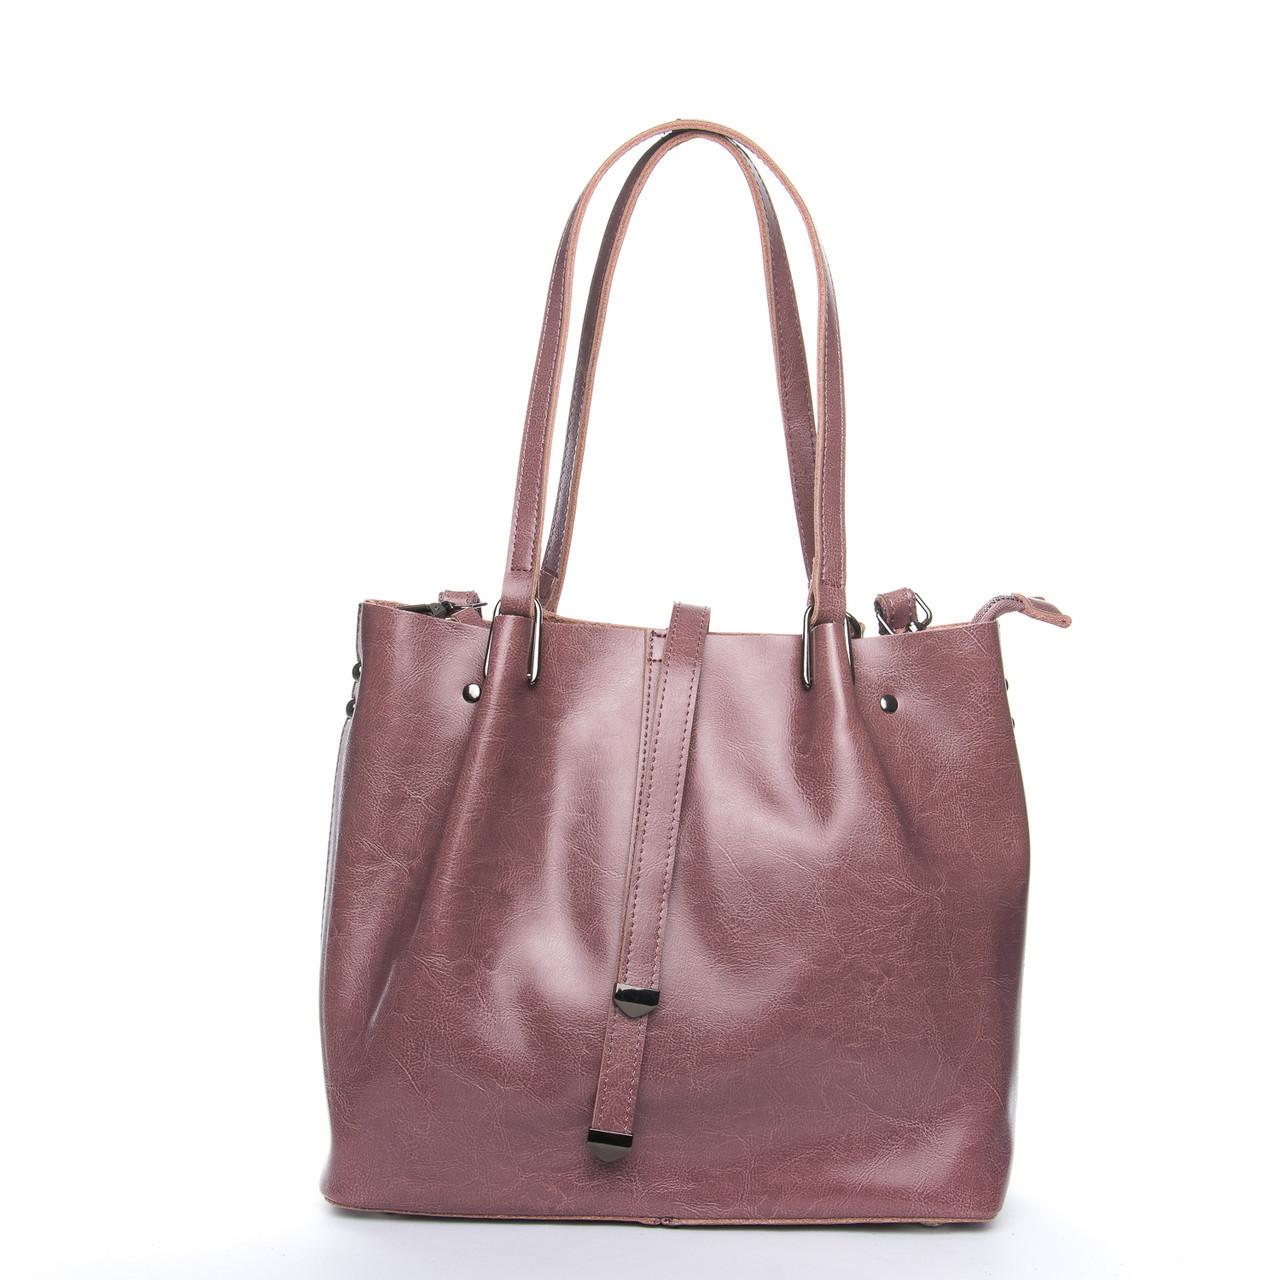 Женская сумка натуральная кожа 2991